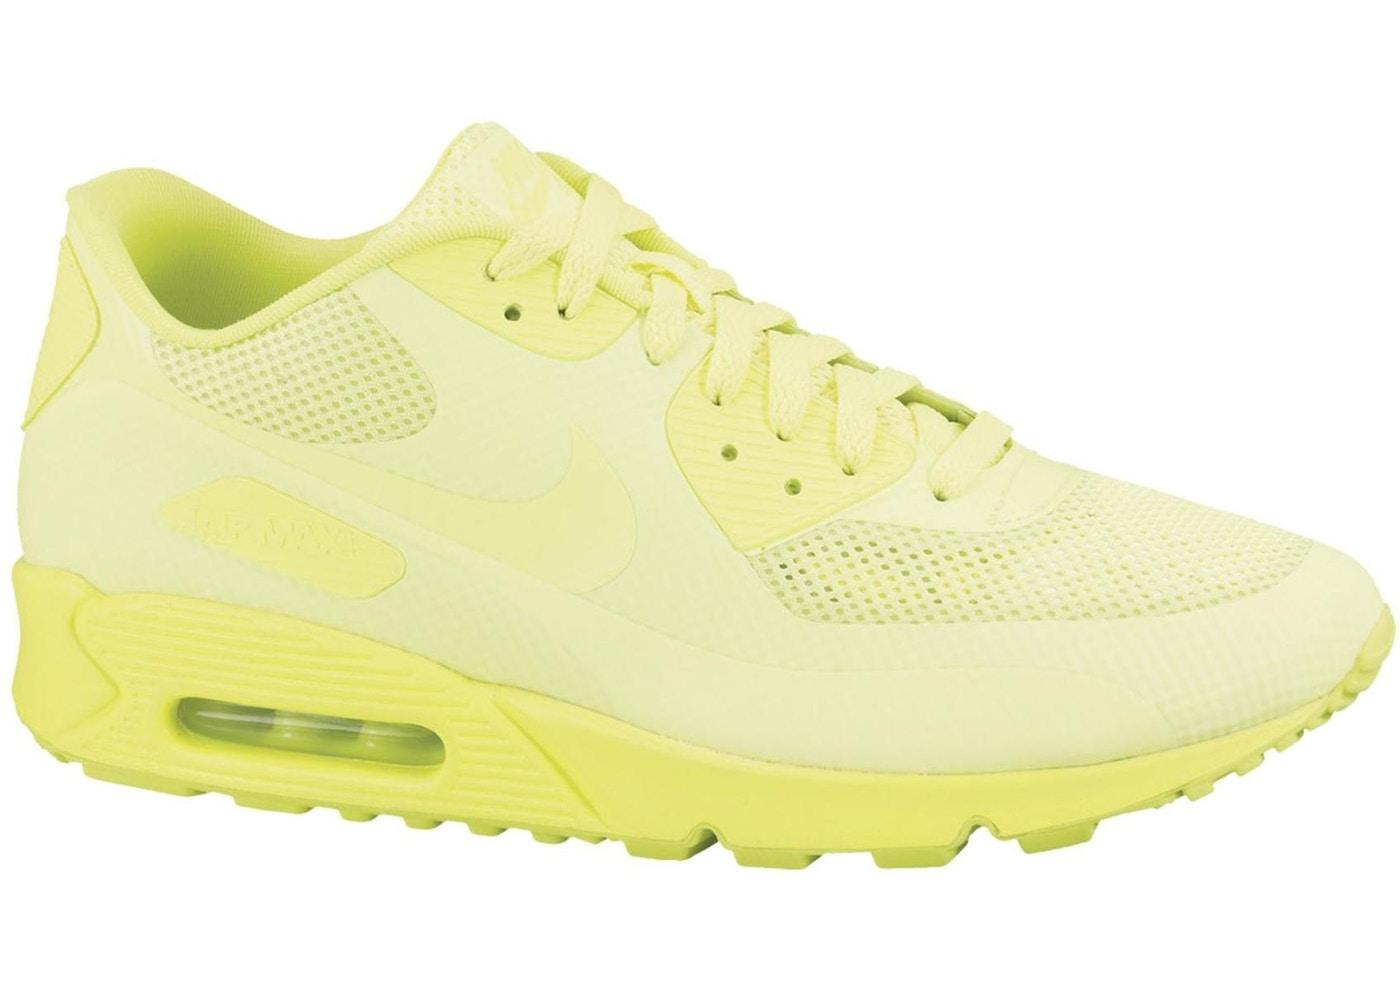 Cuerda embudo rizo  Nike Air Max 90 Hyperfuse Volt - 454446-700